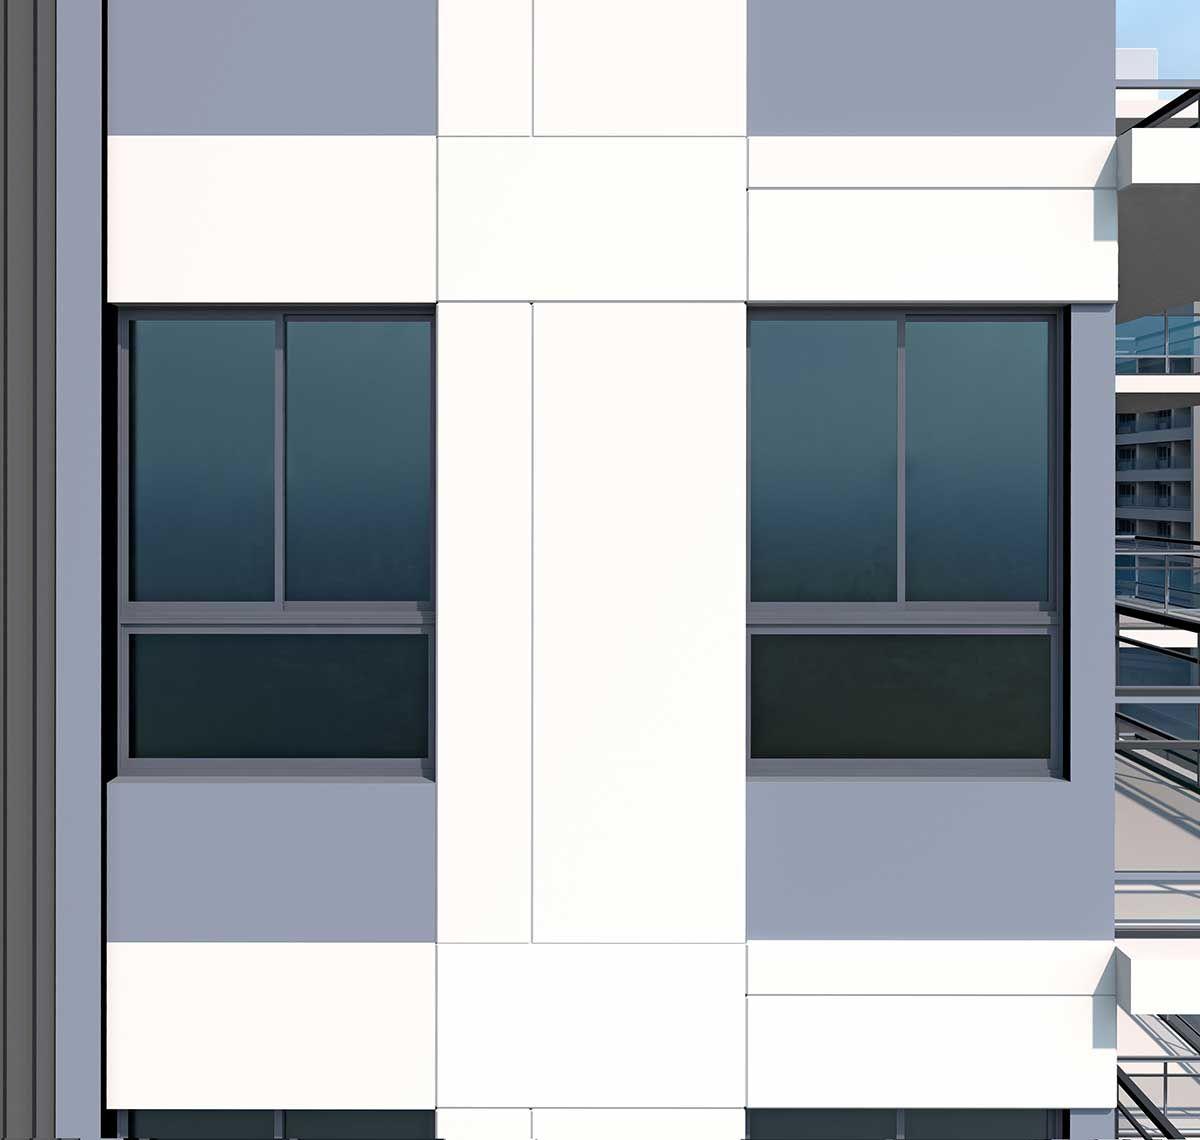 Series 7610/7620 Operating Window Line